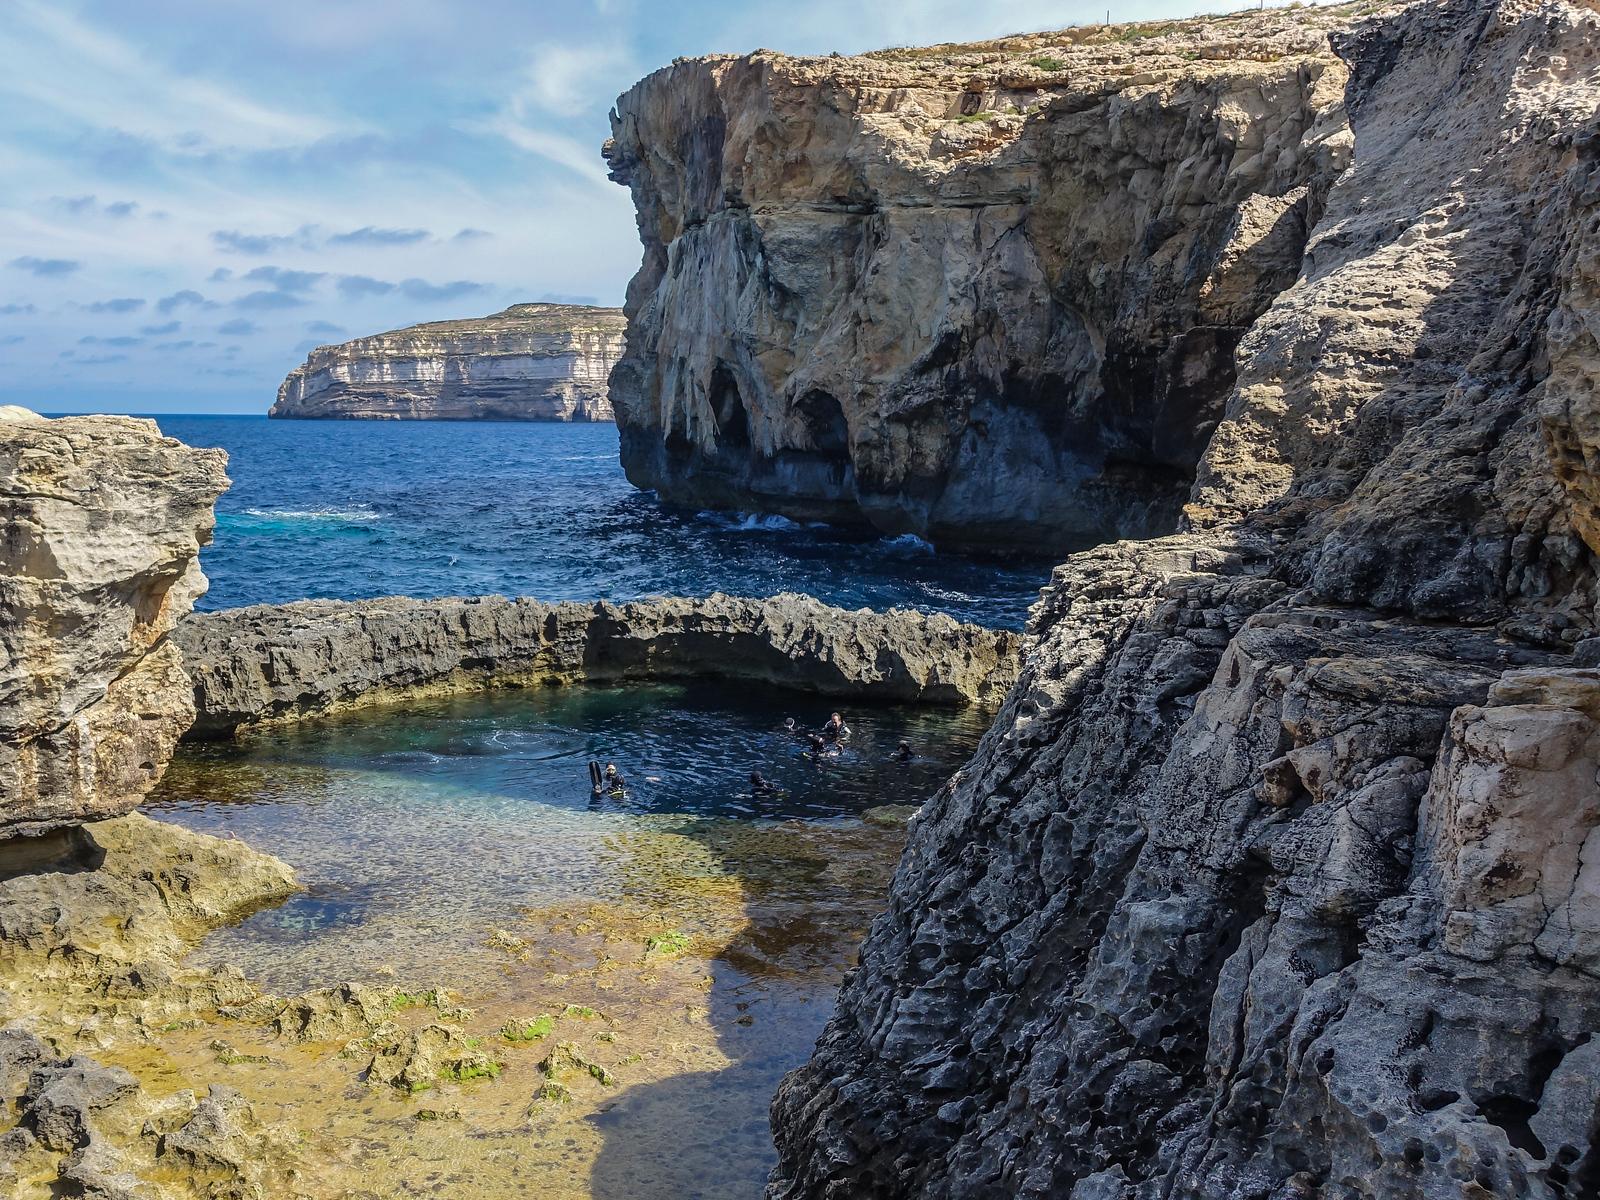 Malta Pictures - the Azure Window